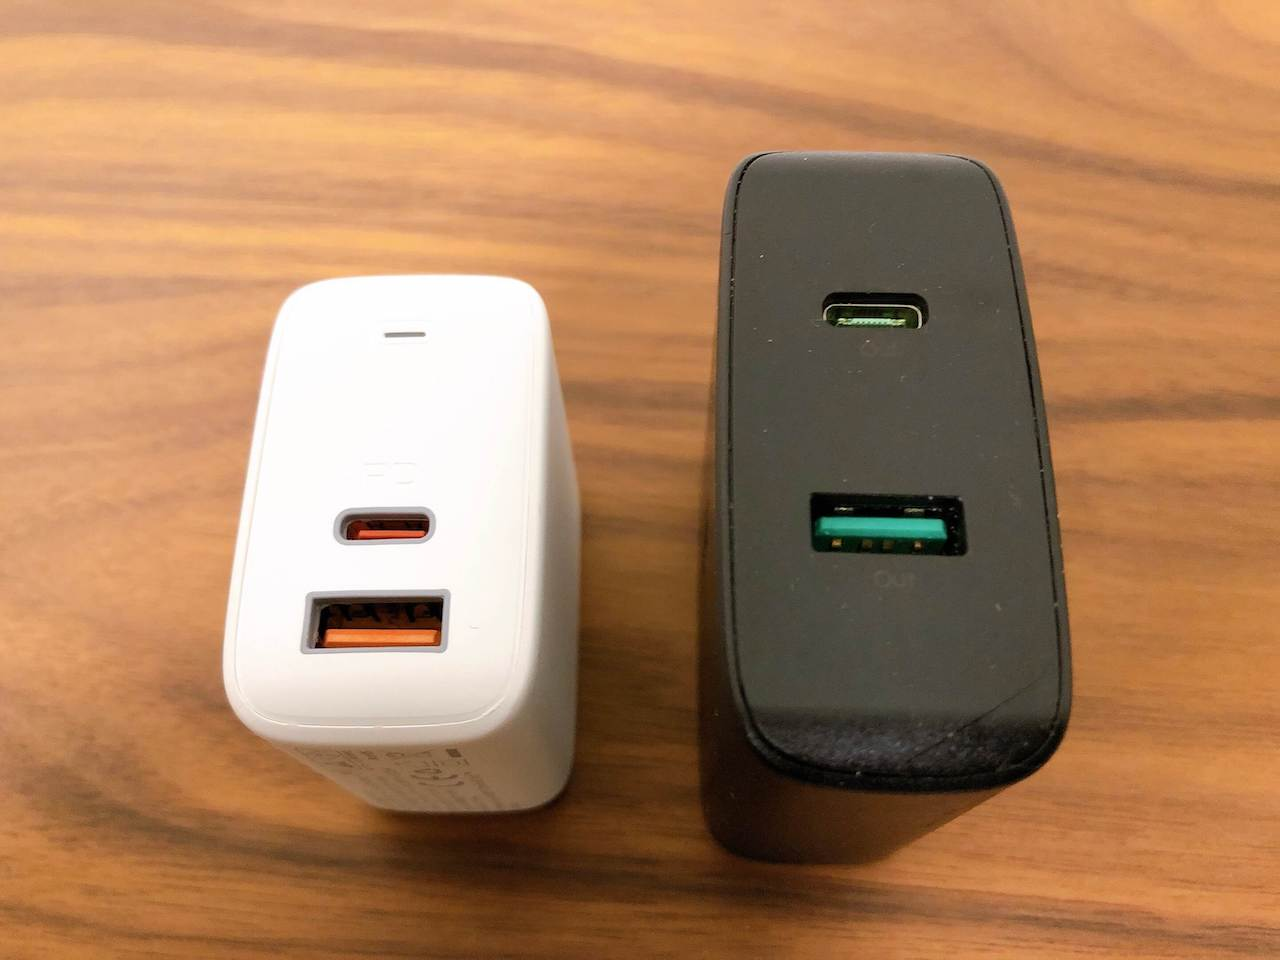 AukeyのUSB充電器「65W PA-B3」(白色)と「45W PA-Y10」(黒色)のUSBポート側を比較した写真です。